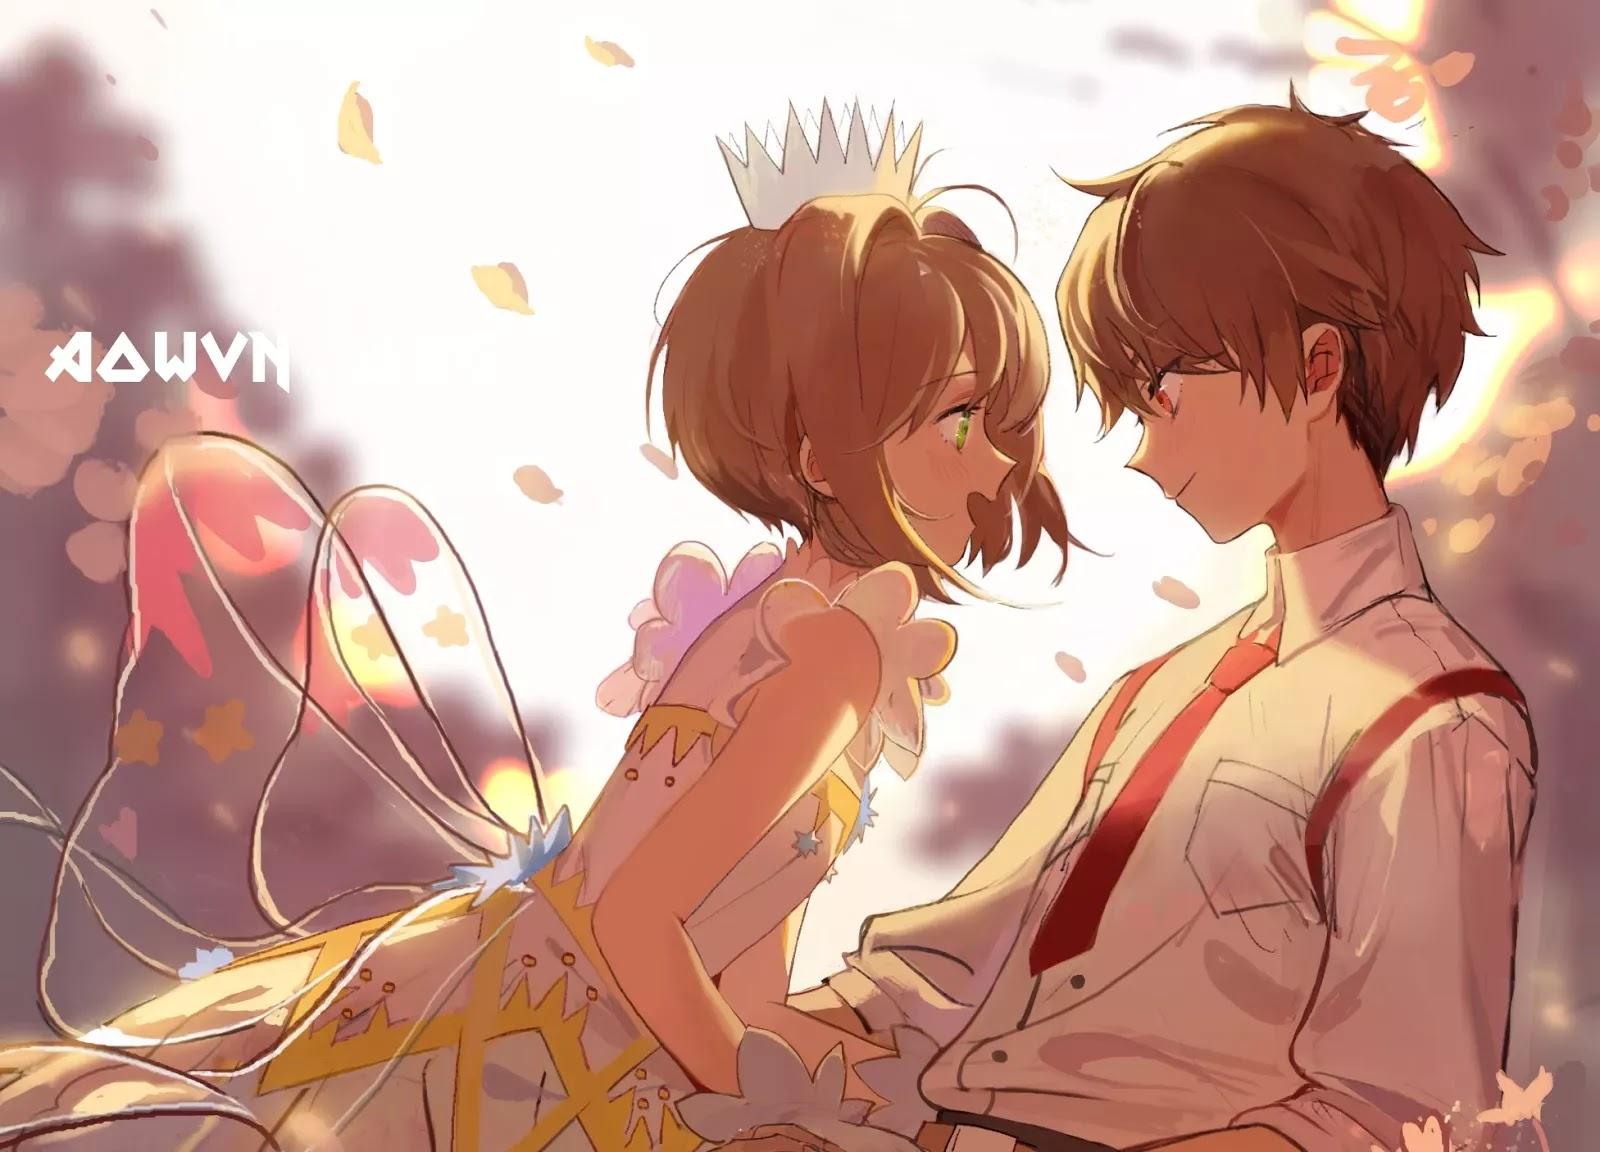 Sakura AowVN%2B%25282%2529 - [ Anime 3gp Mp4 | Ep 22 ] Cardcaptor Sakura: Clear Card-hen | Vietsub - Tuổi Thơ Trở Về